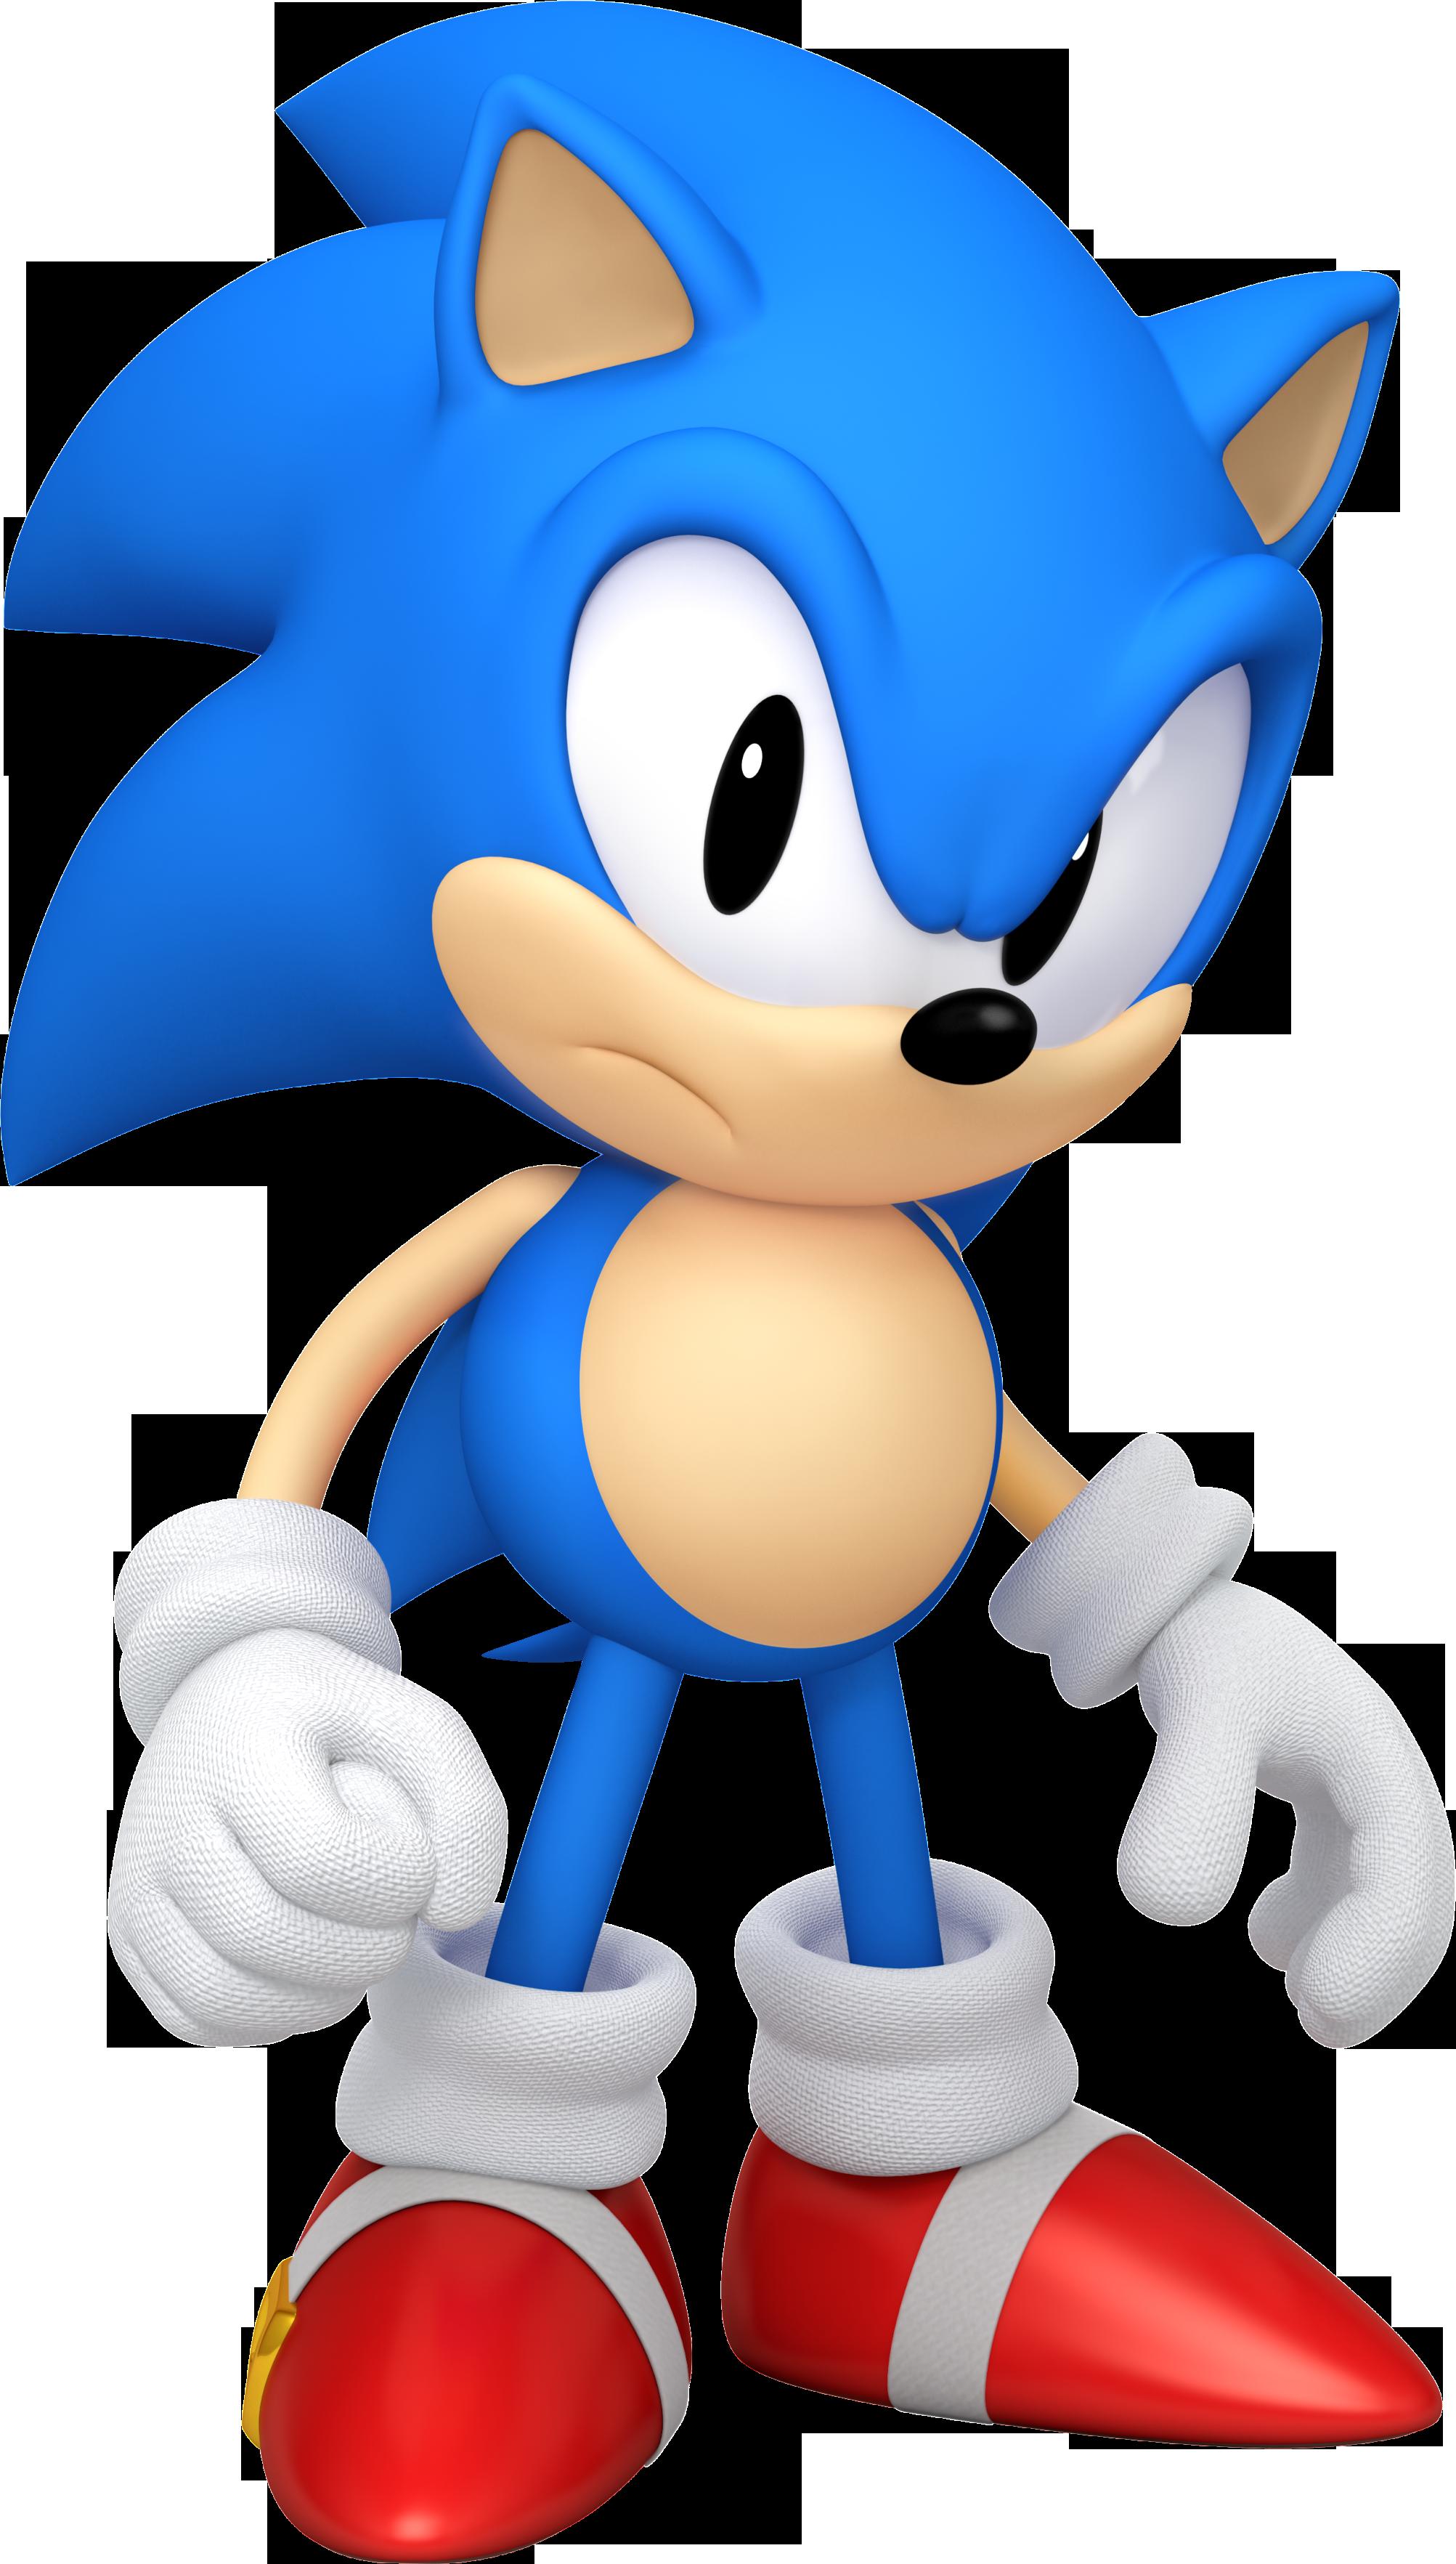 Classic Sonic the Hedgehog